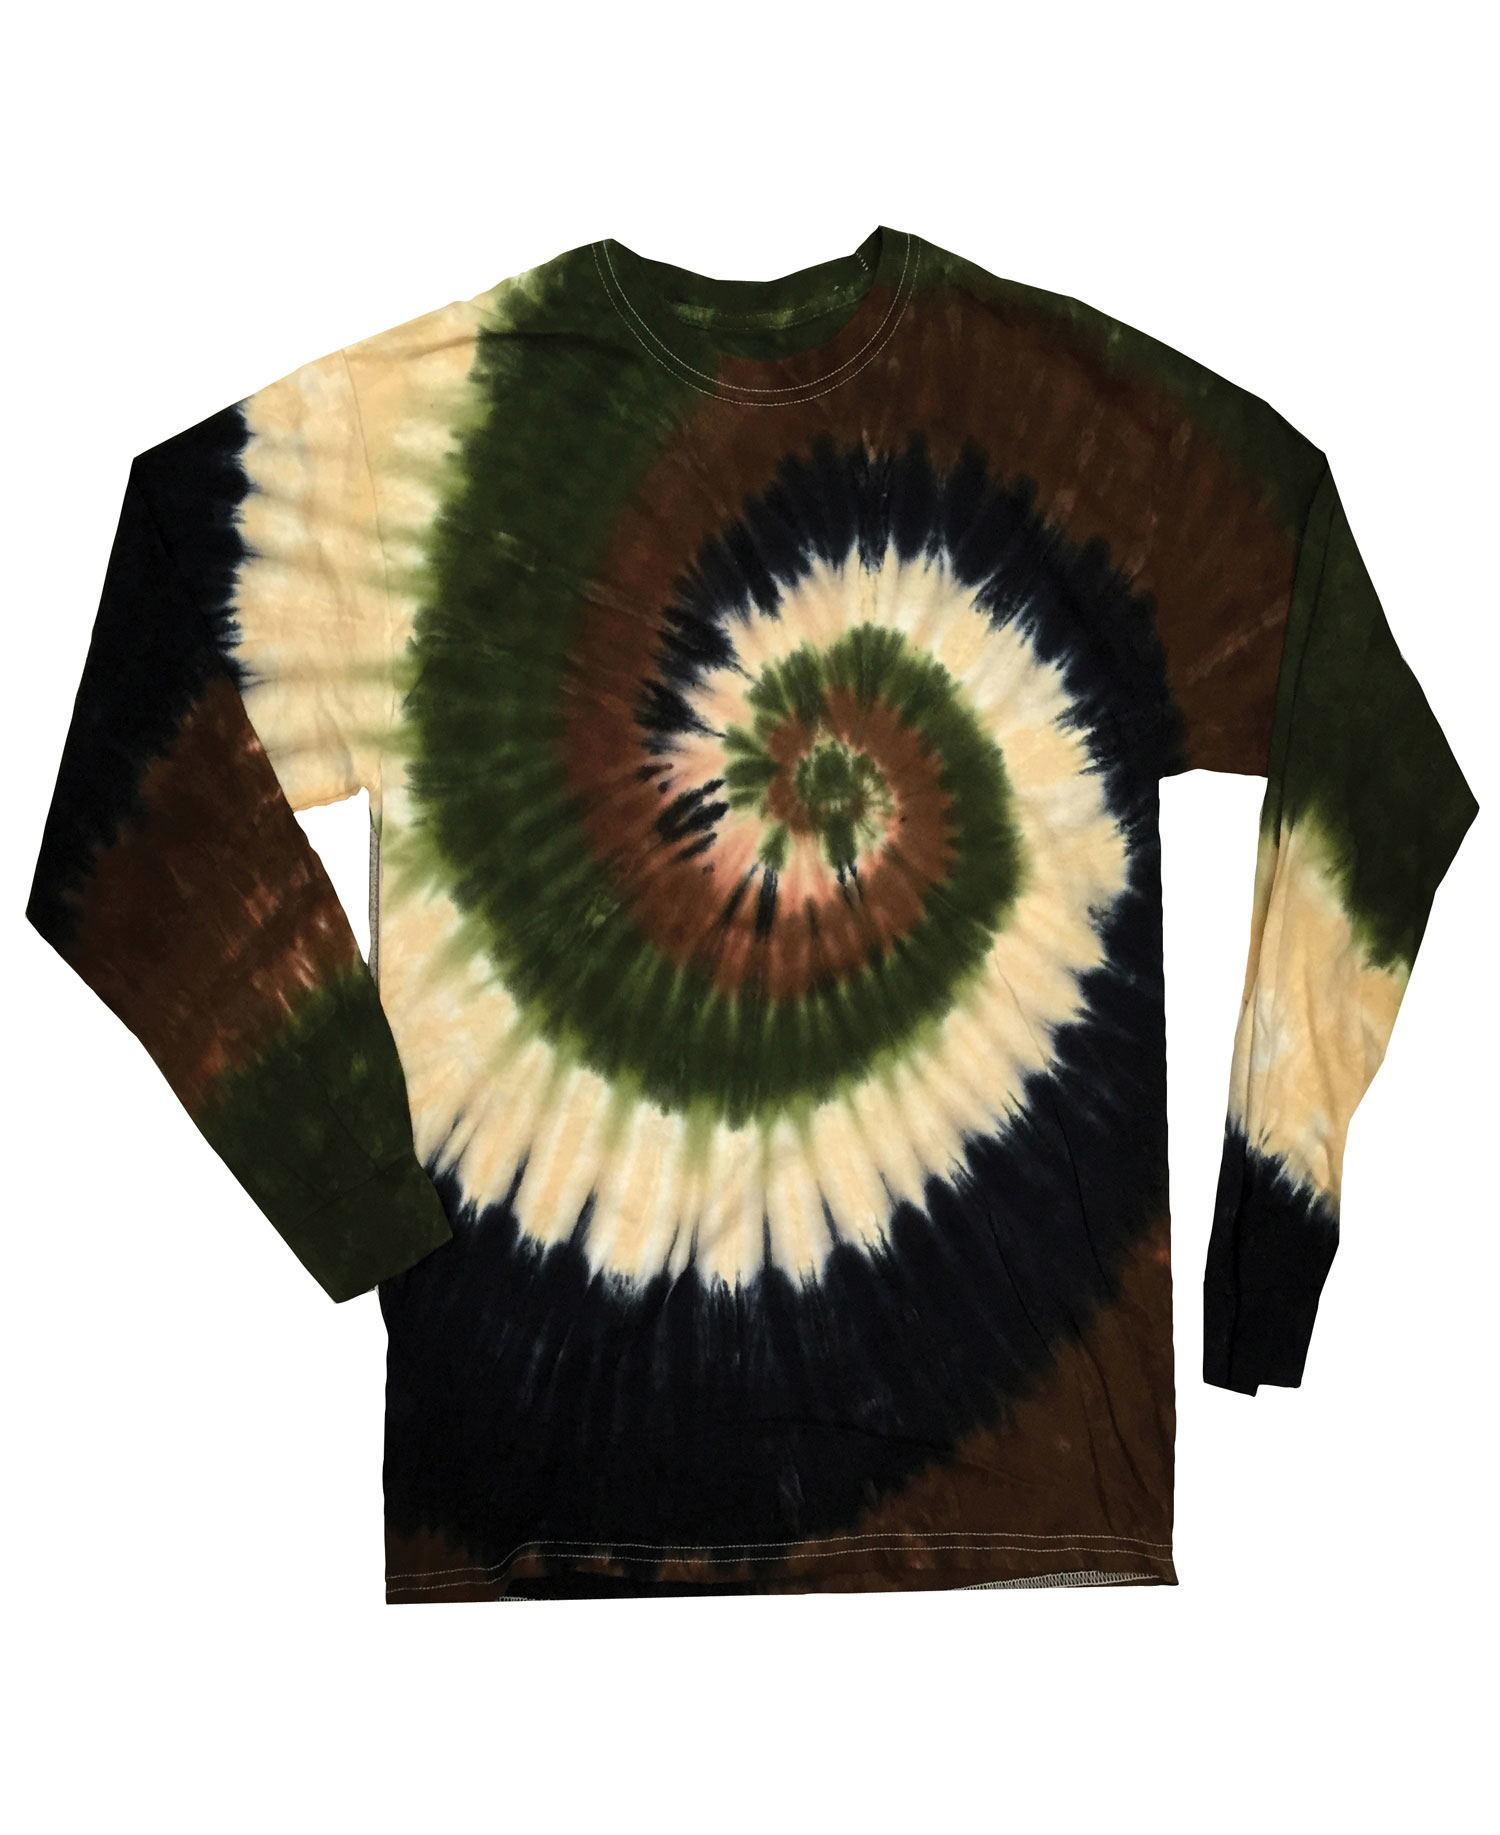 Colortone - T902P Camo Swirl Yth Long Sleeve